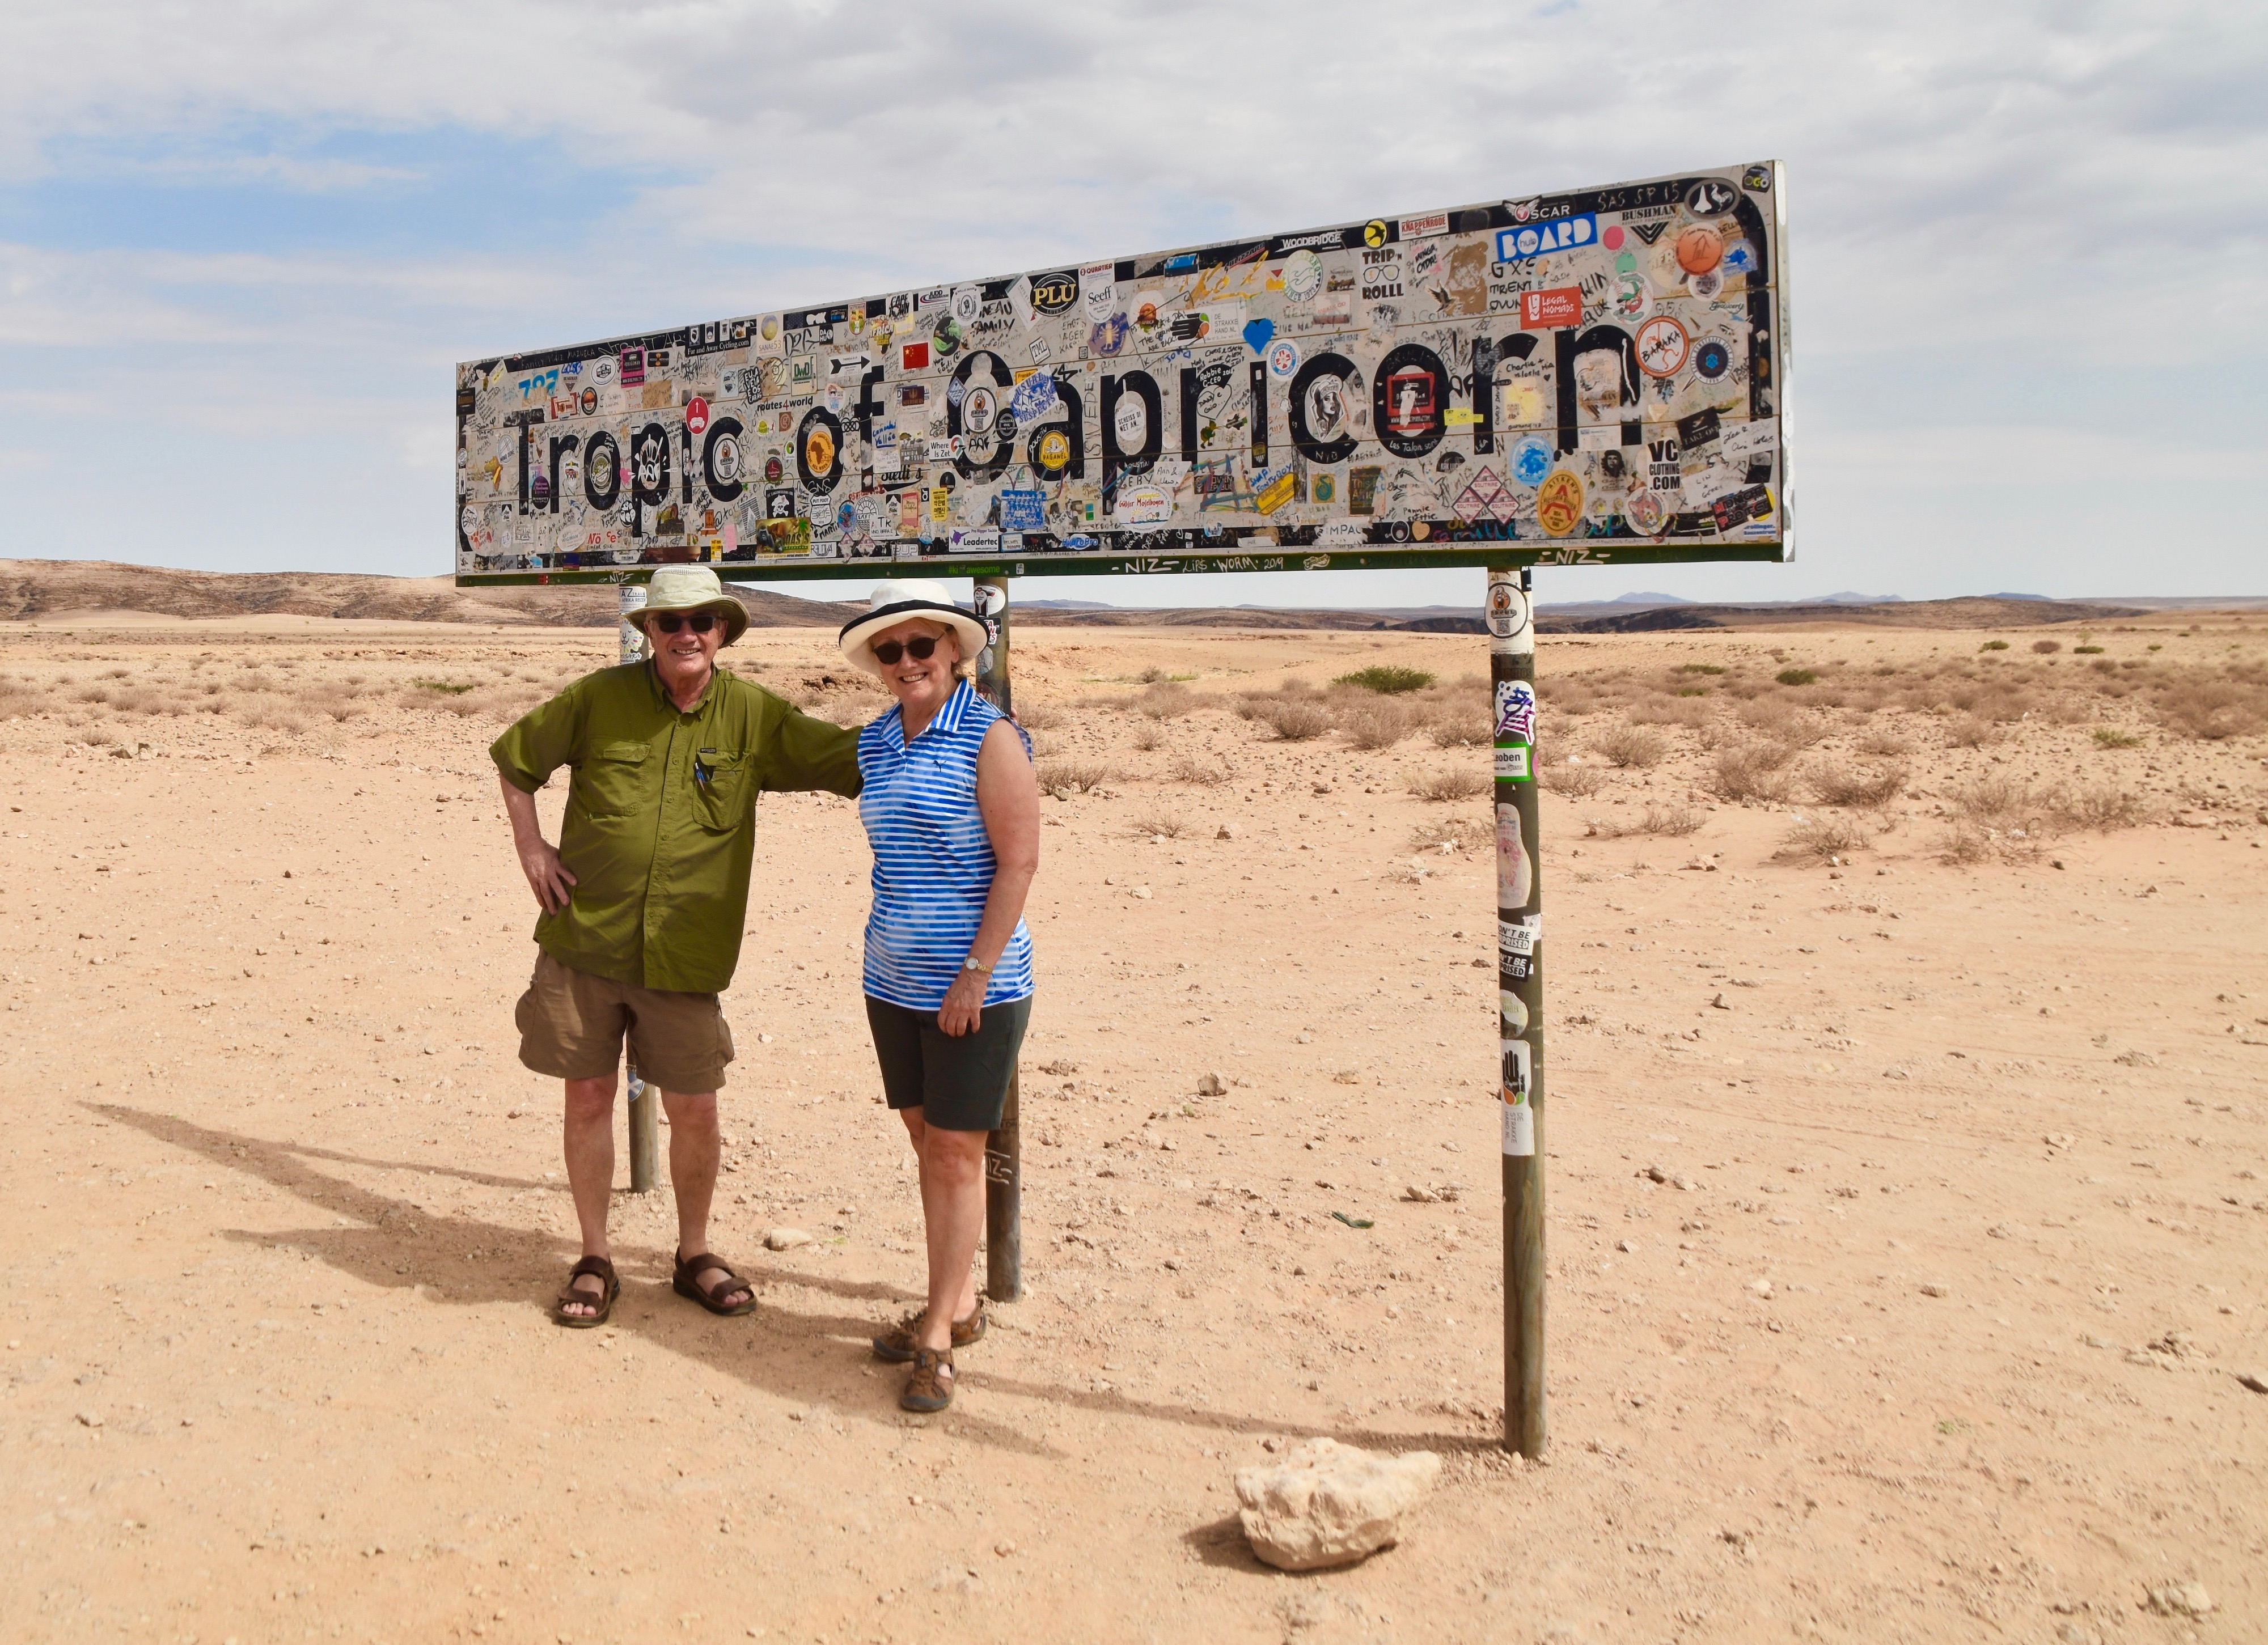 Exploring Namibia - Tropic of Capricorn